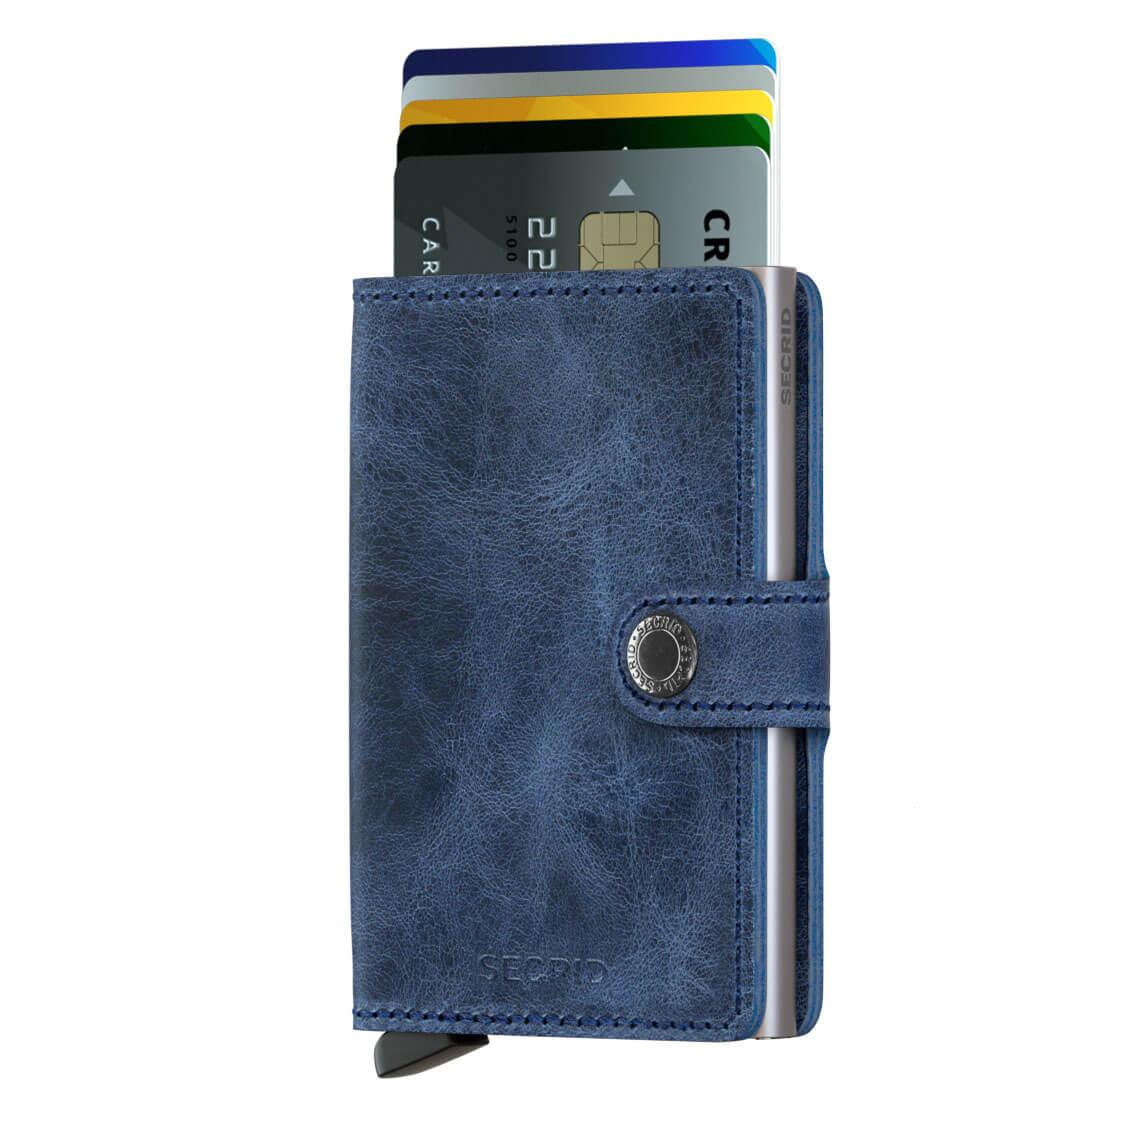 Bourse Vintage Blue Mini Portefeuille Secrid MafkJ9koY